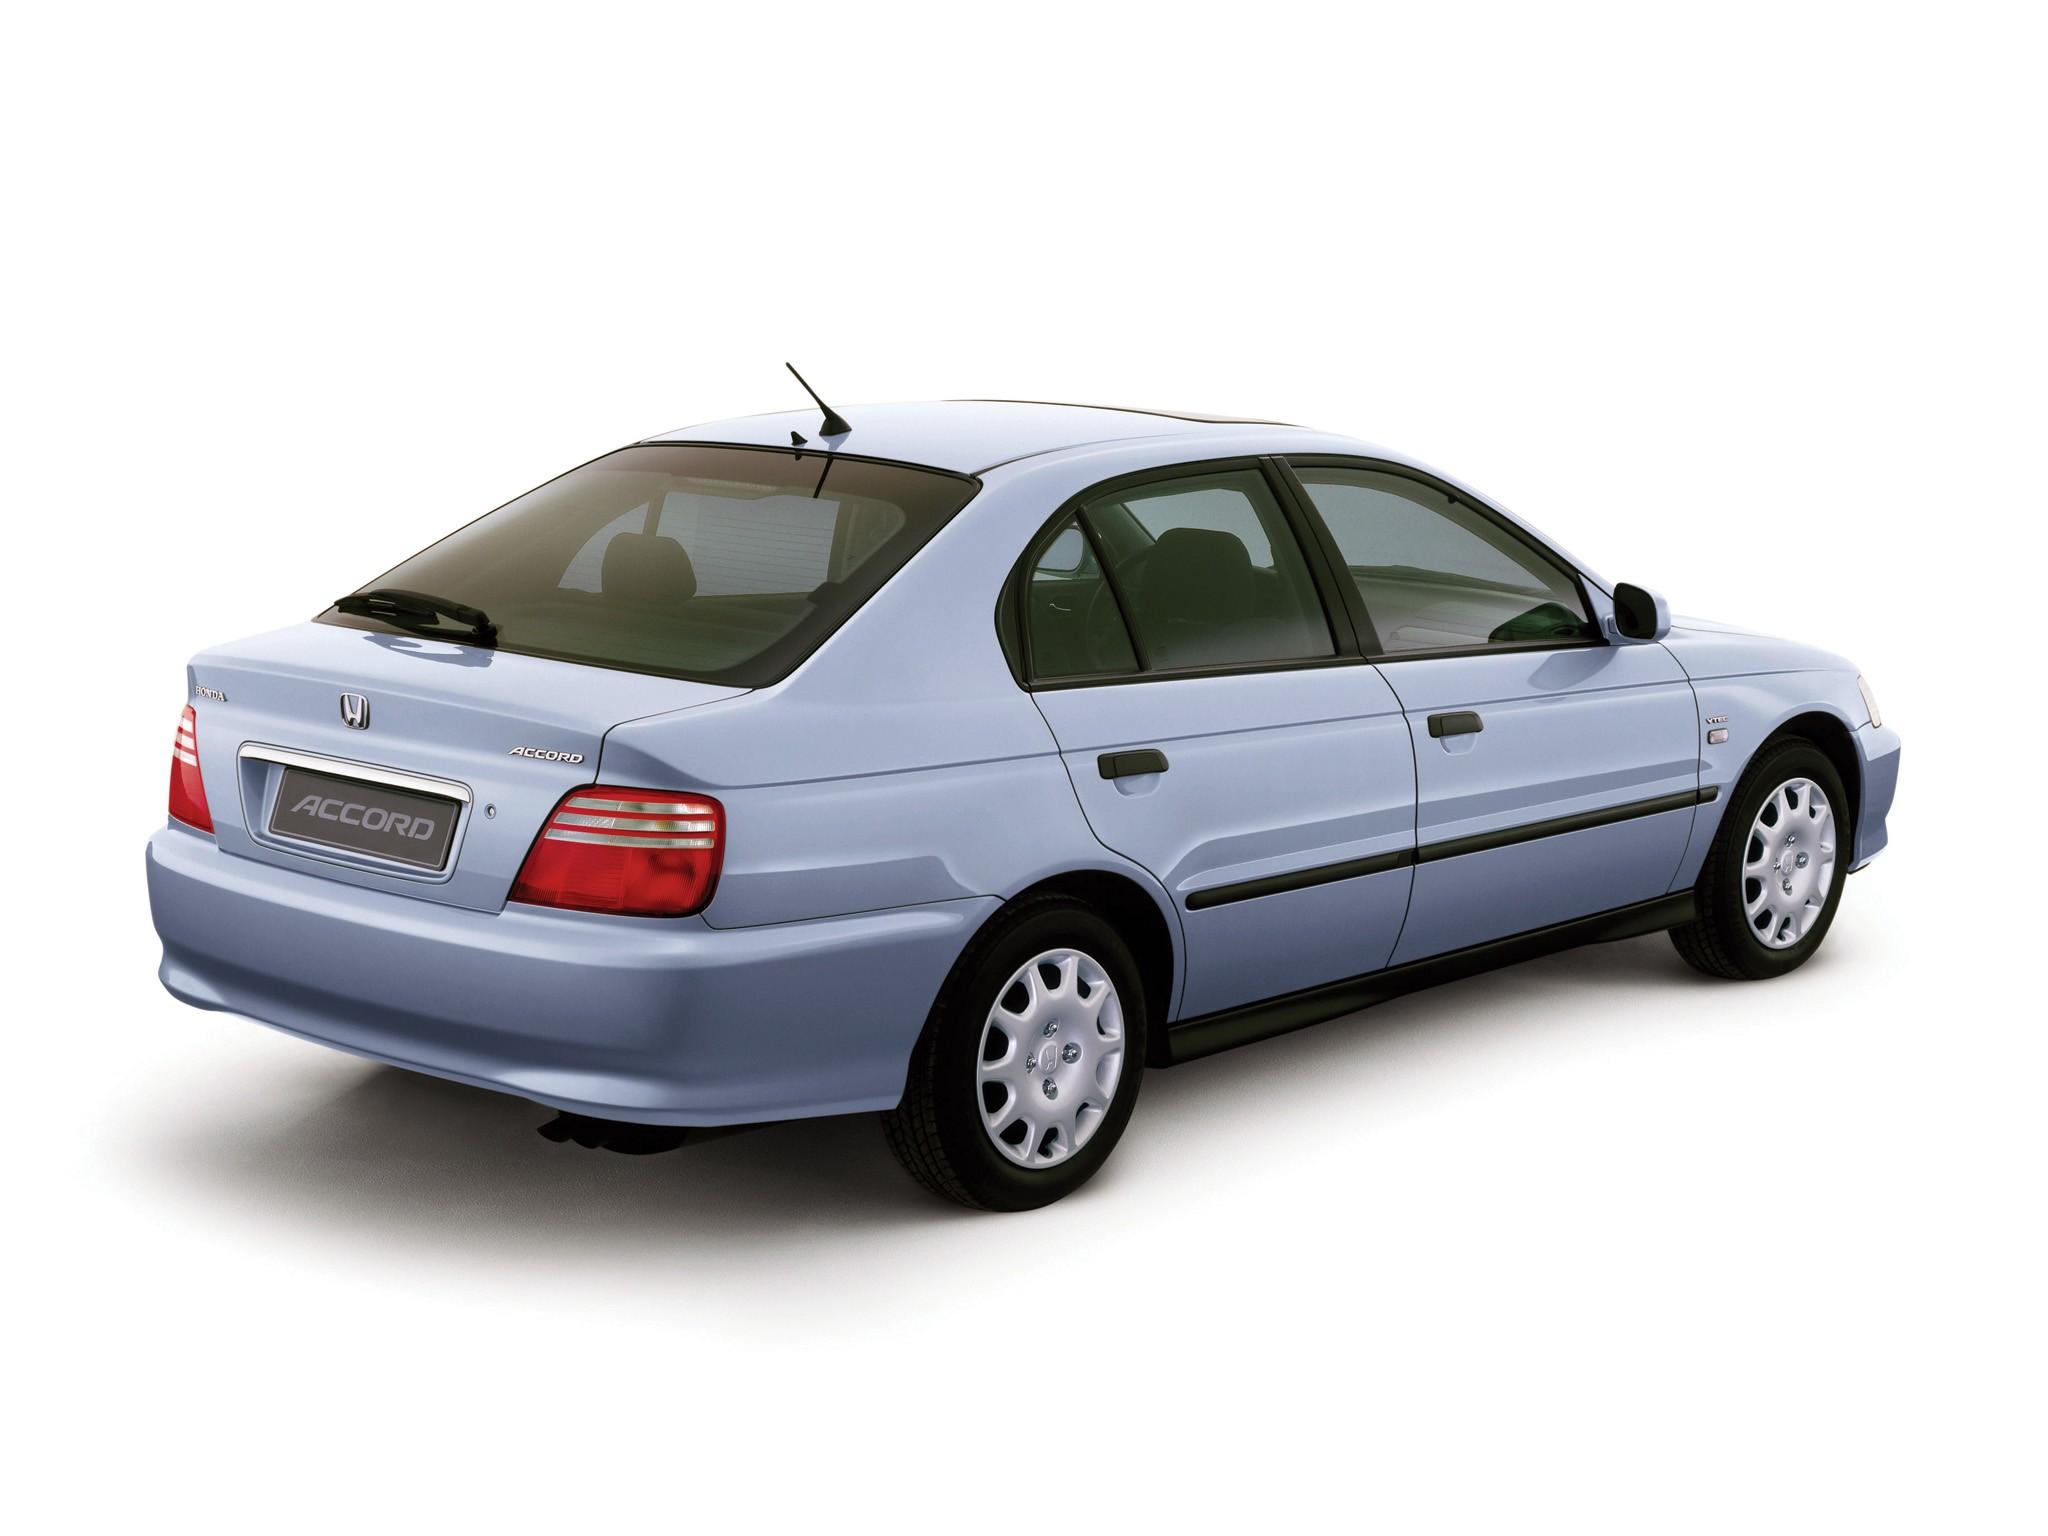 diagram for 2000 honda accord door 1979 trans am starter wiring 5 doors specs 1999 2001 autoevolution